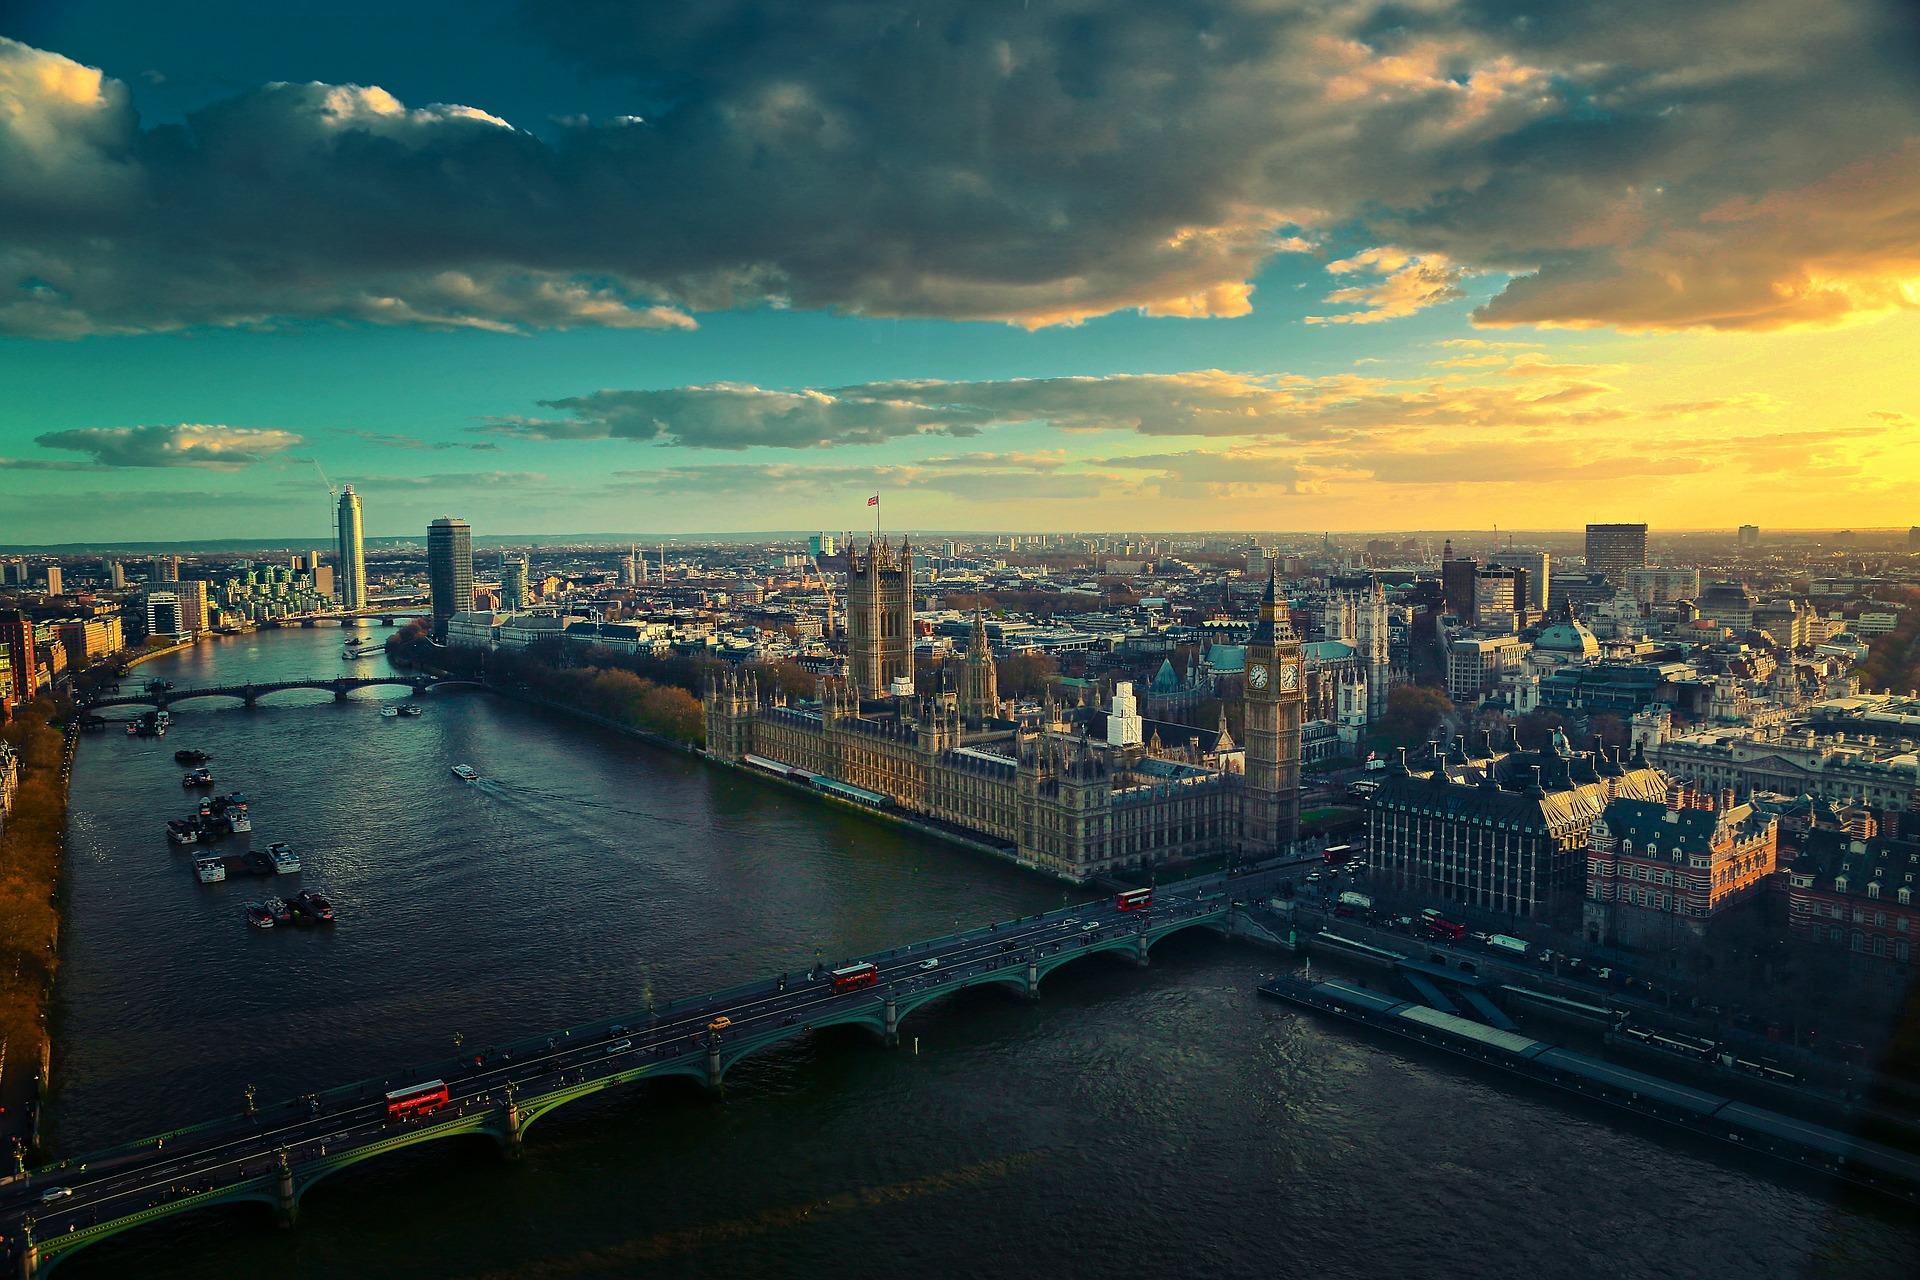 London © liushuquan / Pixabay